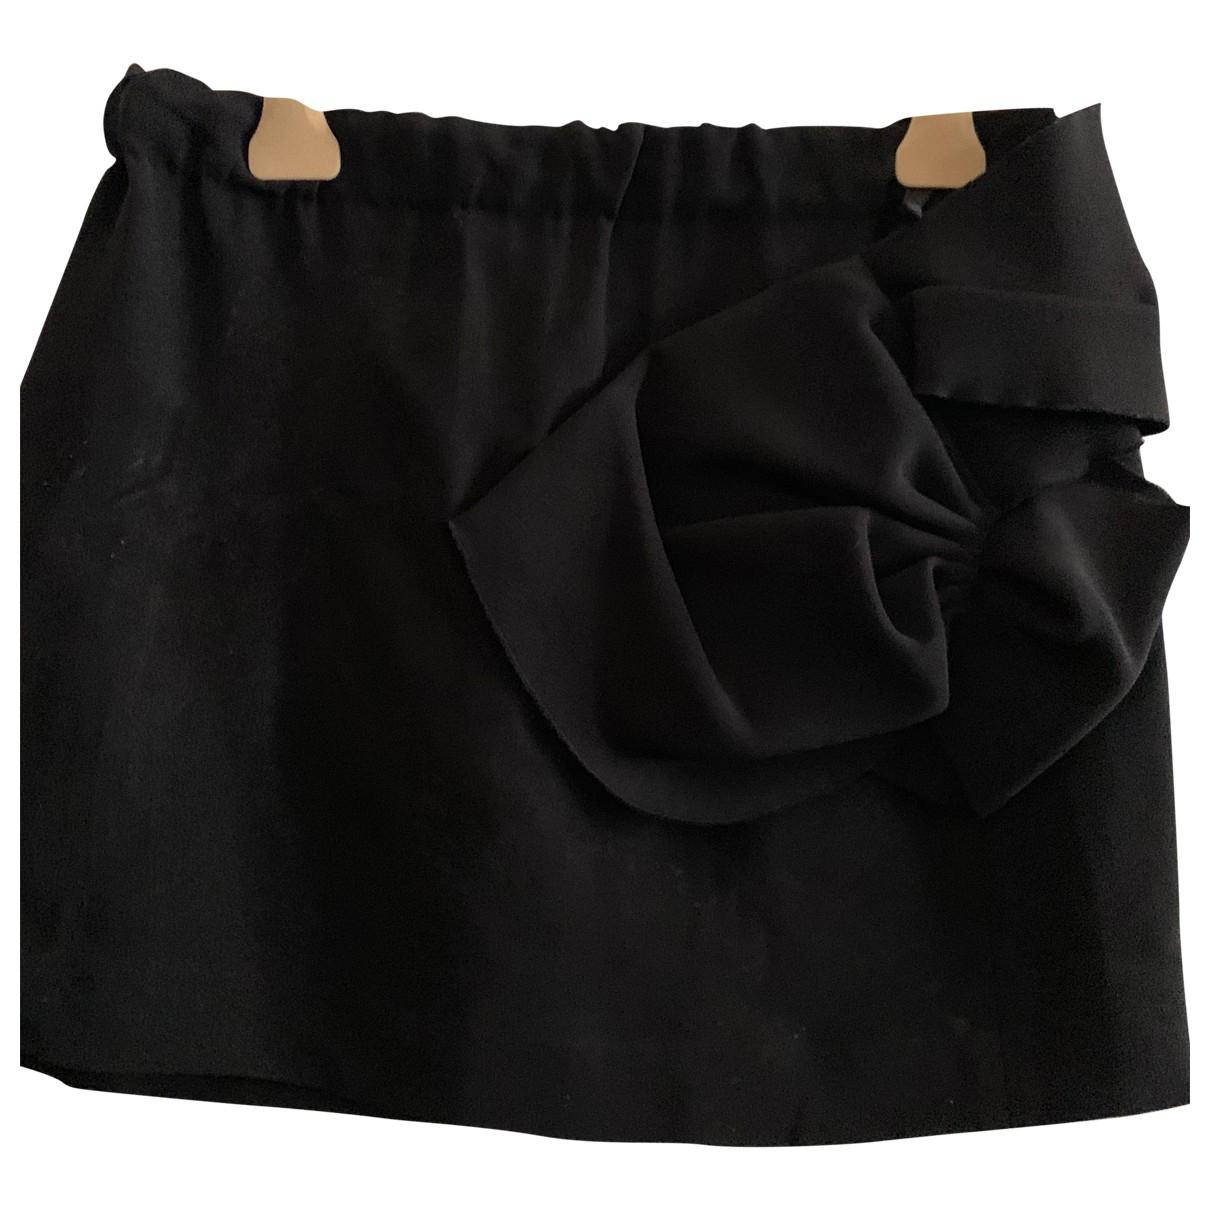 Miu Miu \N Black skirt for Women 44 IT